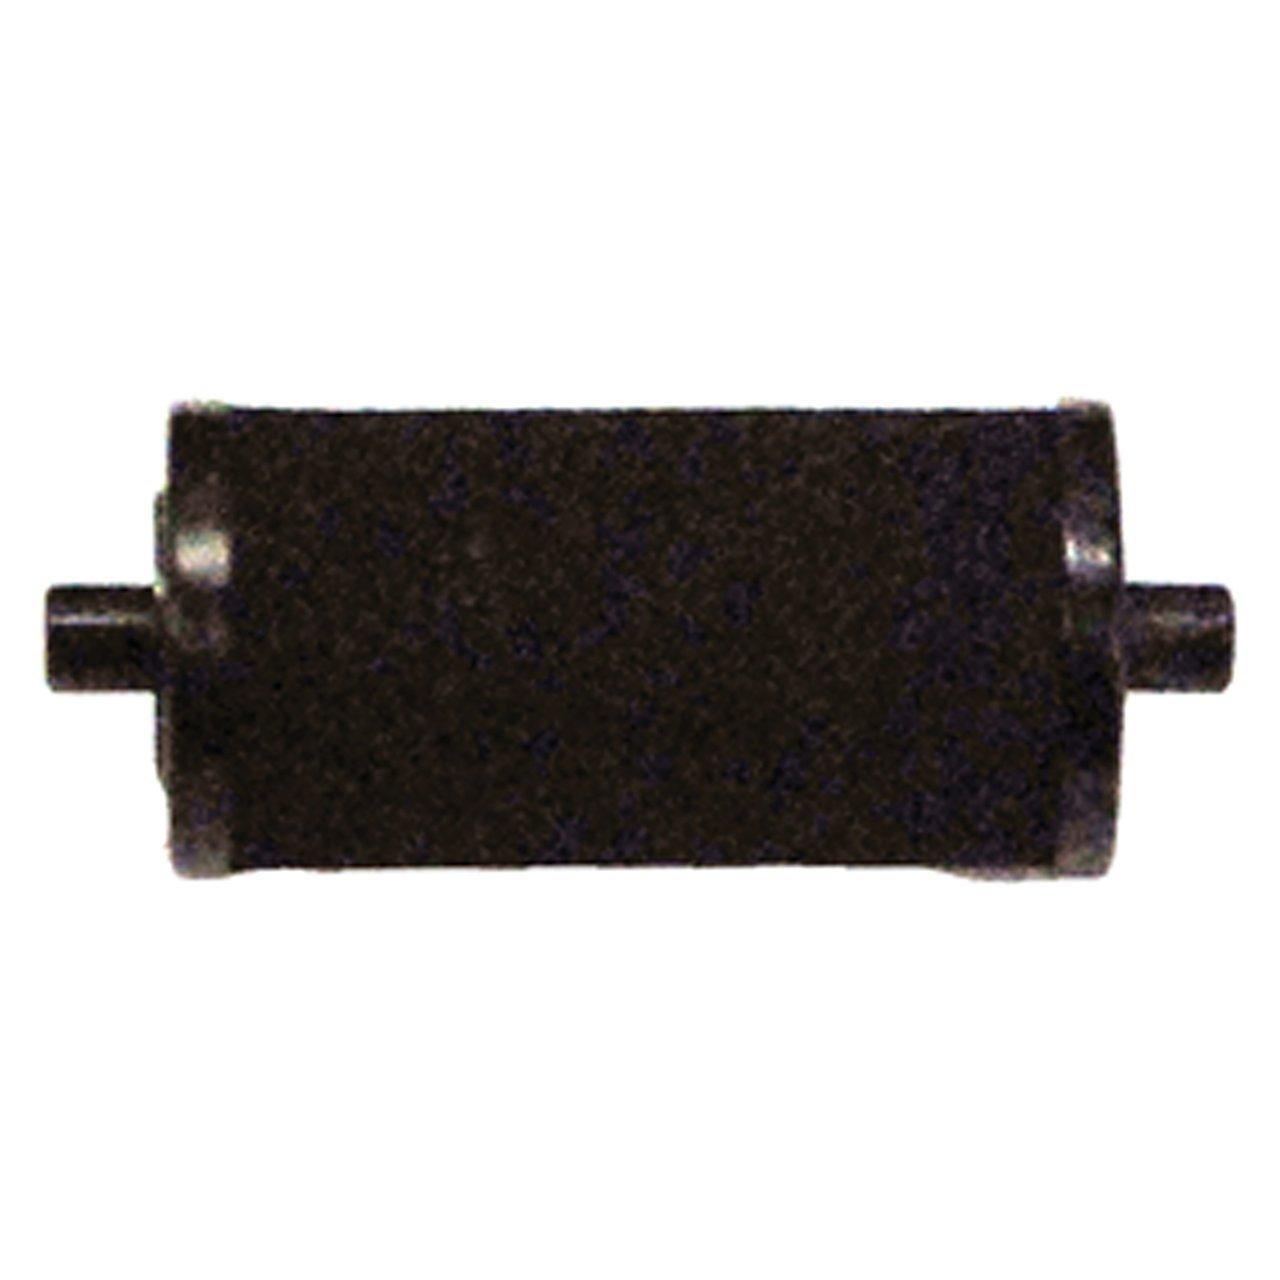 DayMark Date Coder Replacement Ink Roller, Black Ink, for DM4 SpeedyMark 4, 2-Line Marking Gun (Pack of 5)